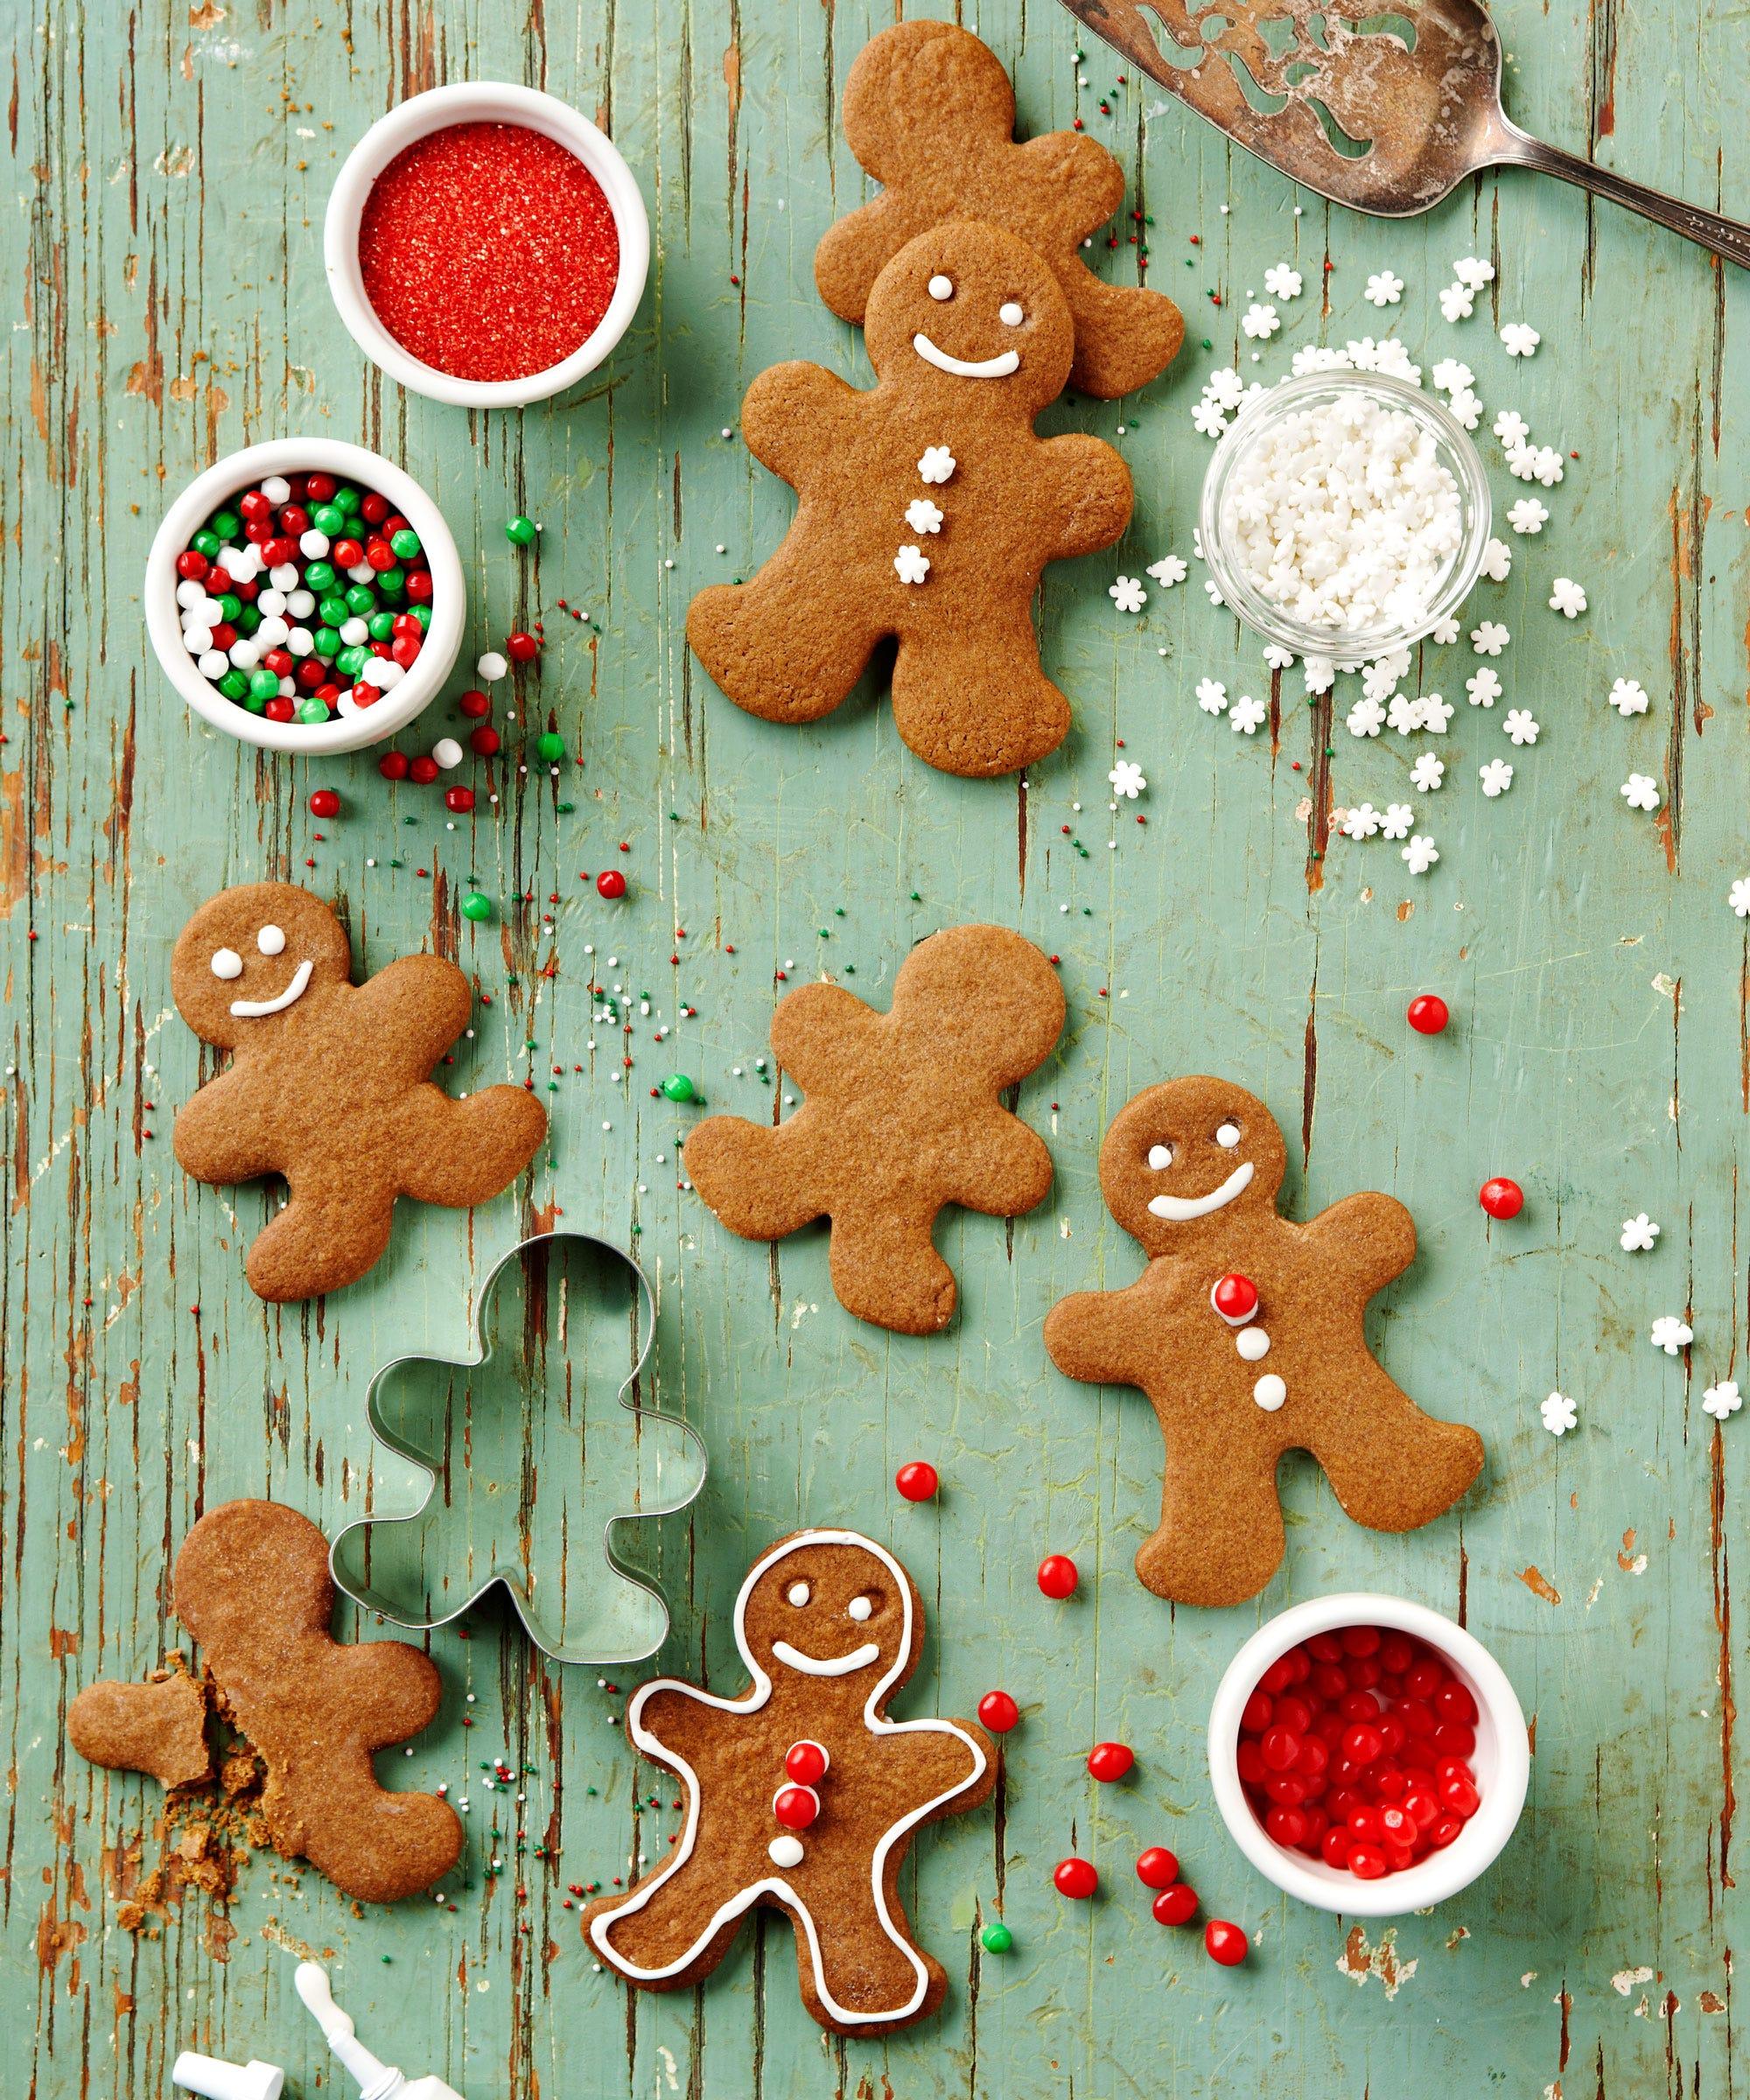 Best Holiday Cookies Christmas Cookie List Ranking